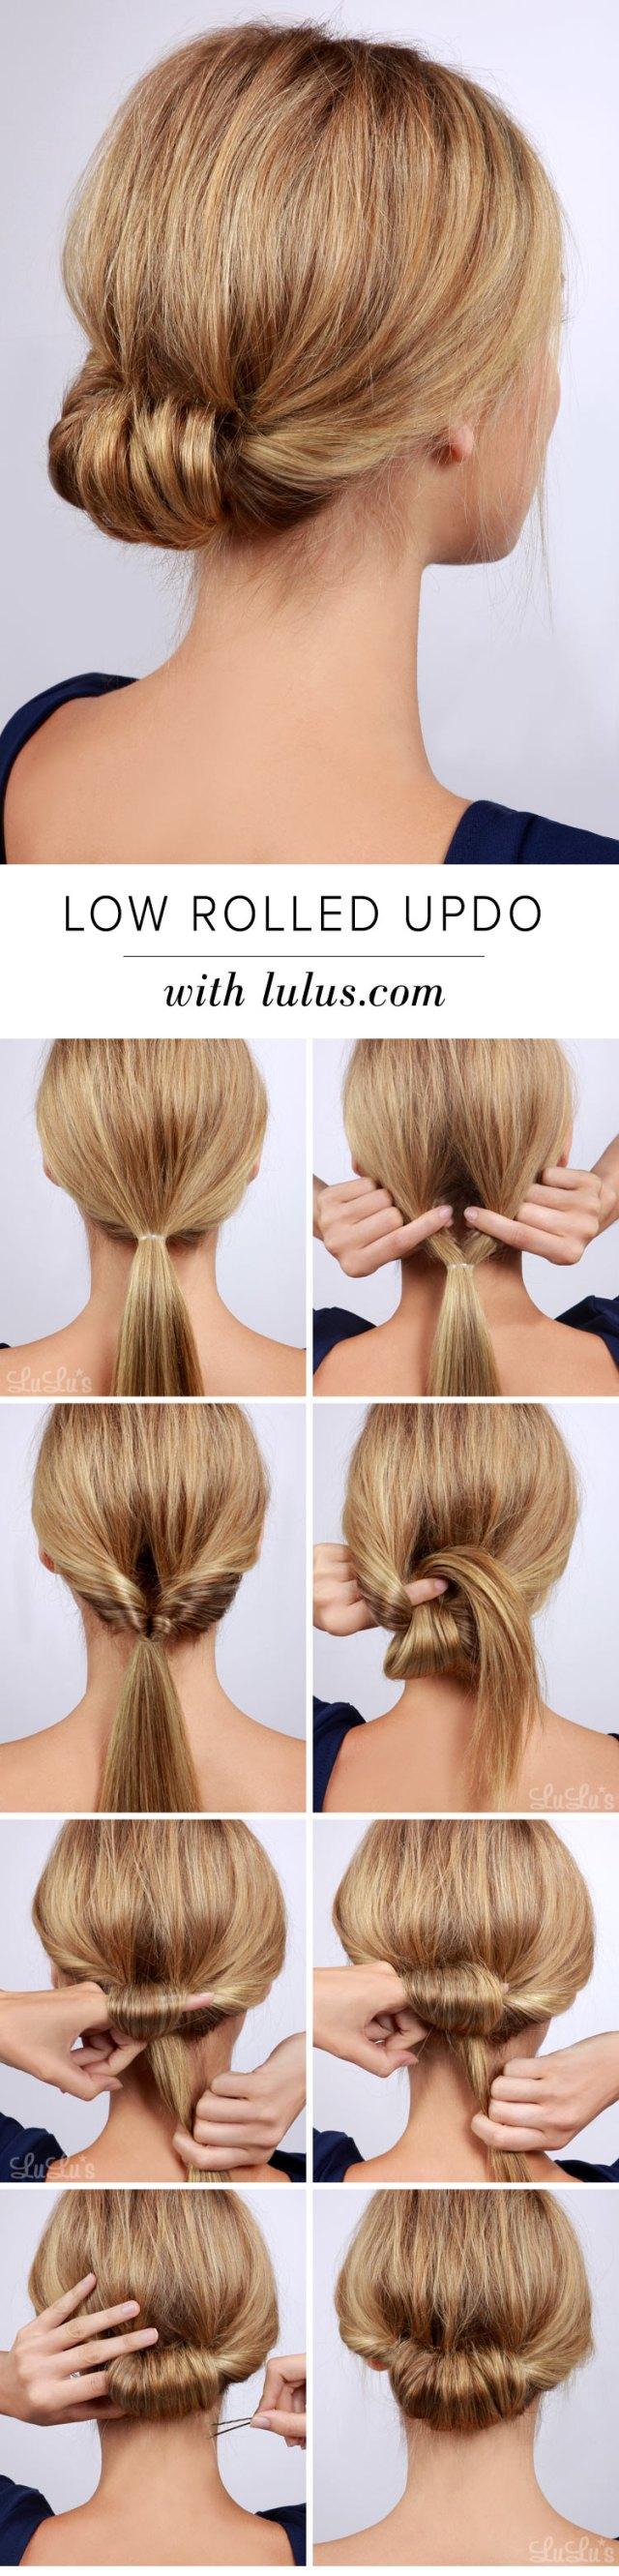 lulus how-to: low rolled updo hair tutorial - lulus